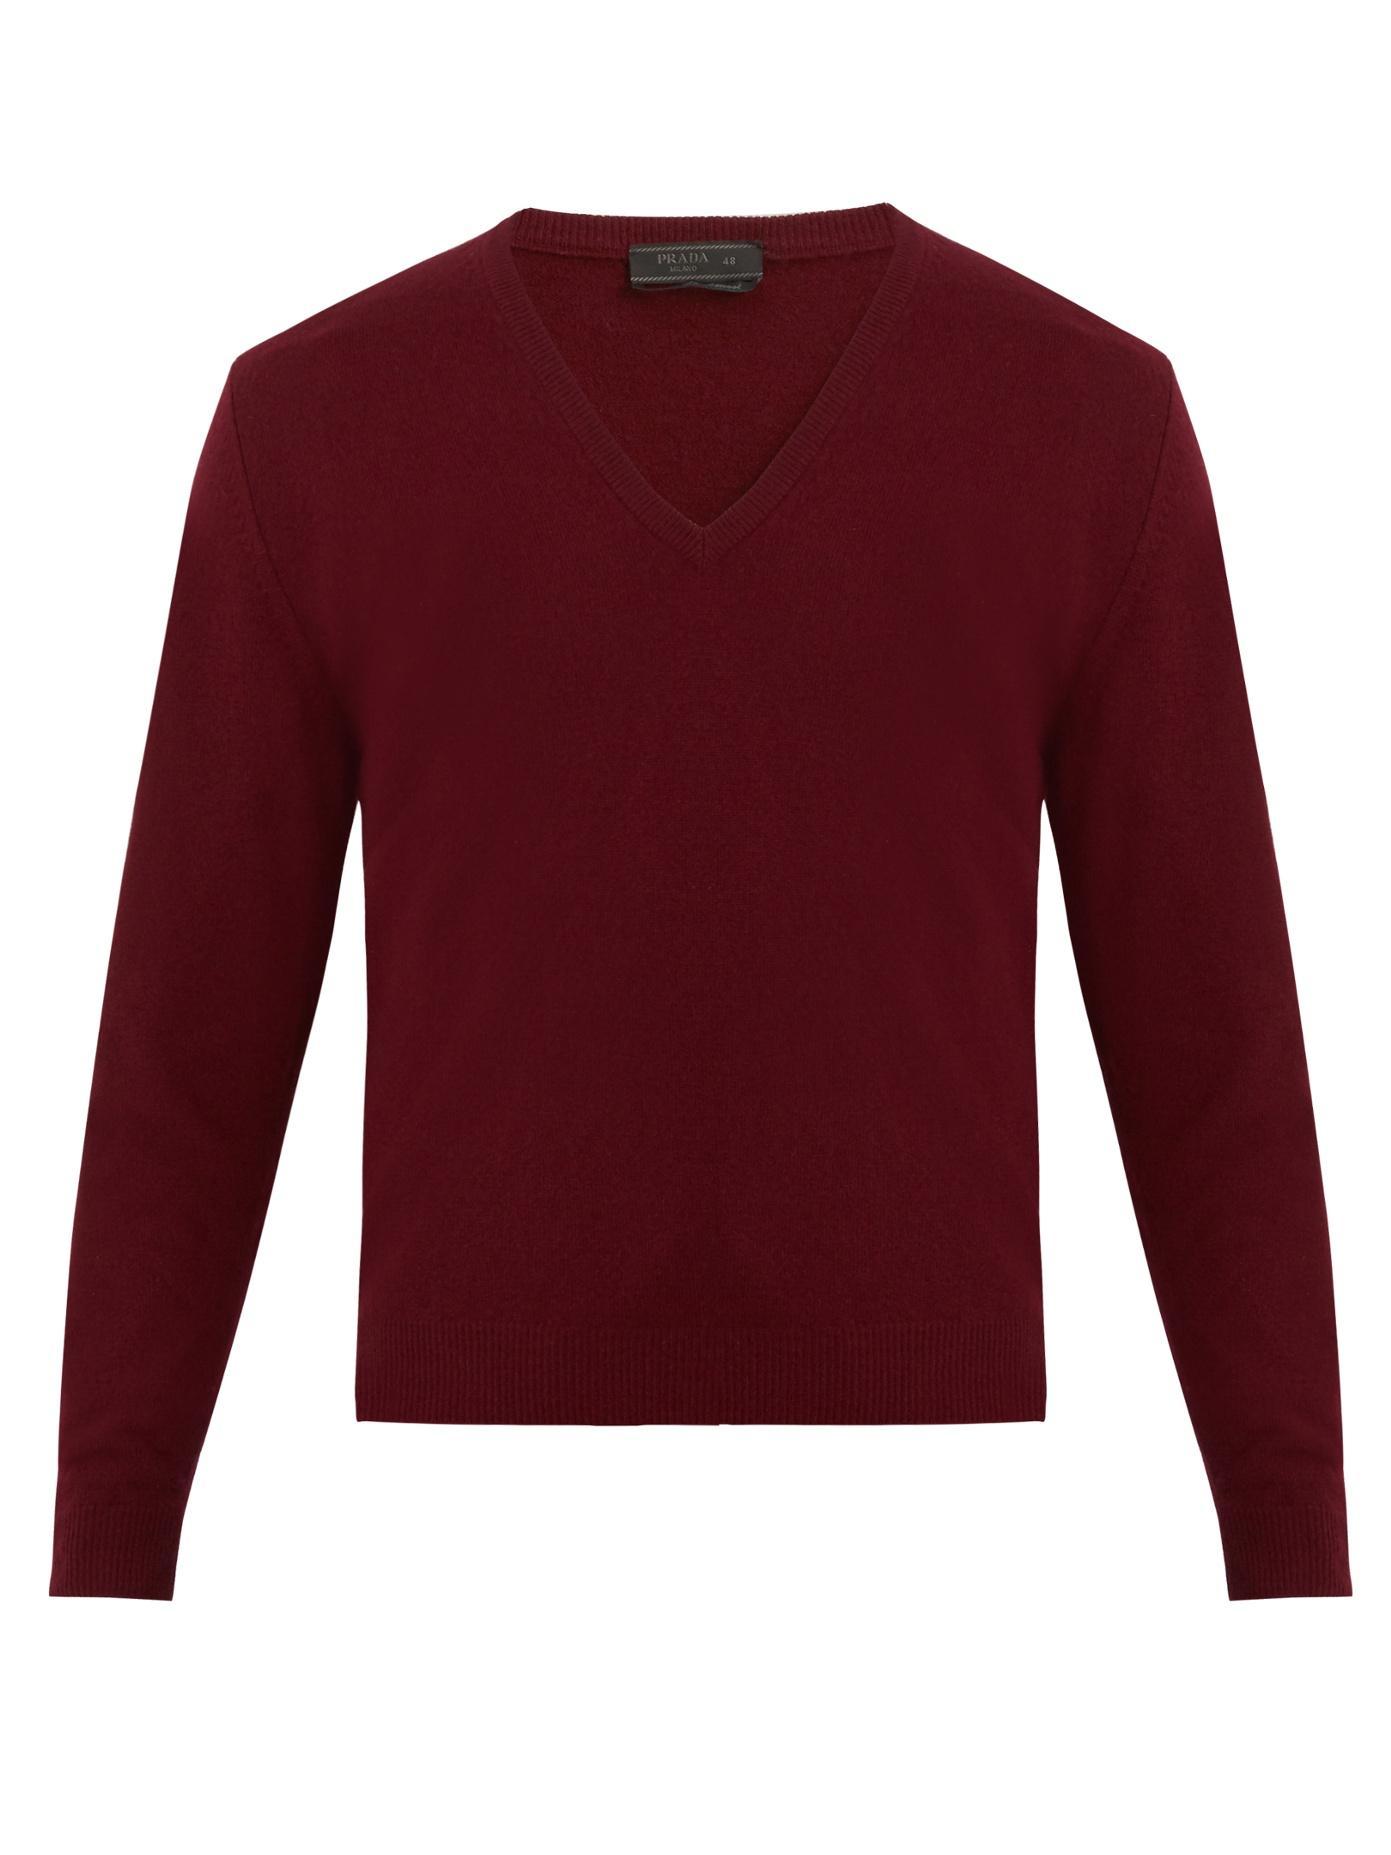 Prada V-neck Cashmere Sweater In Burgundy